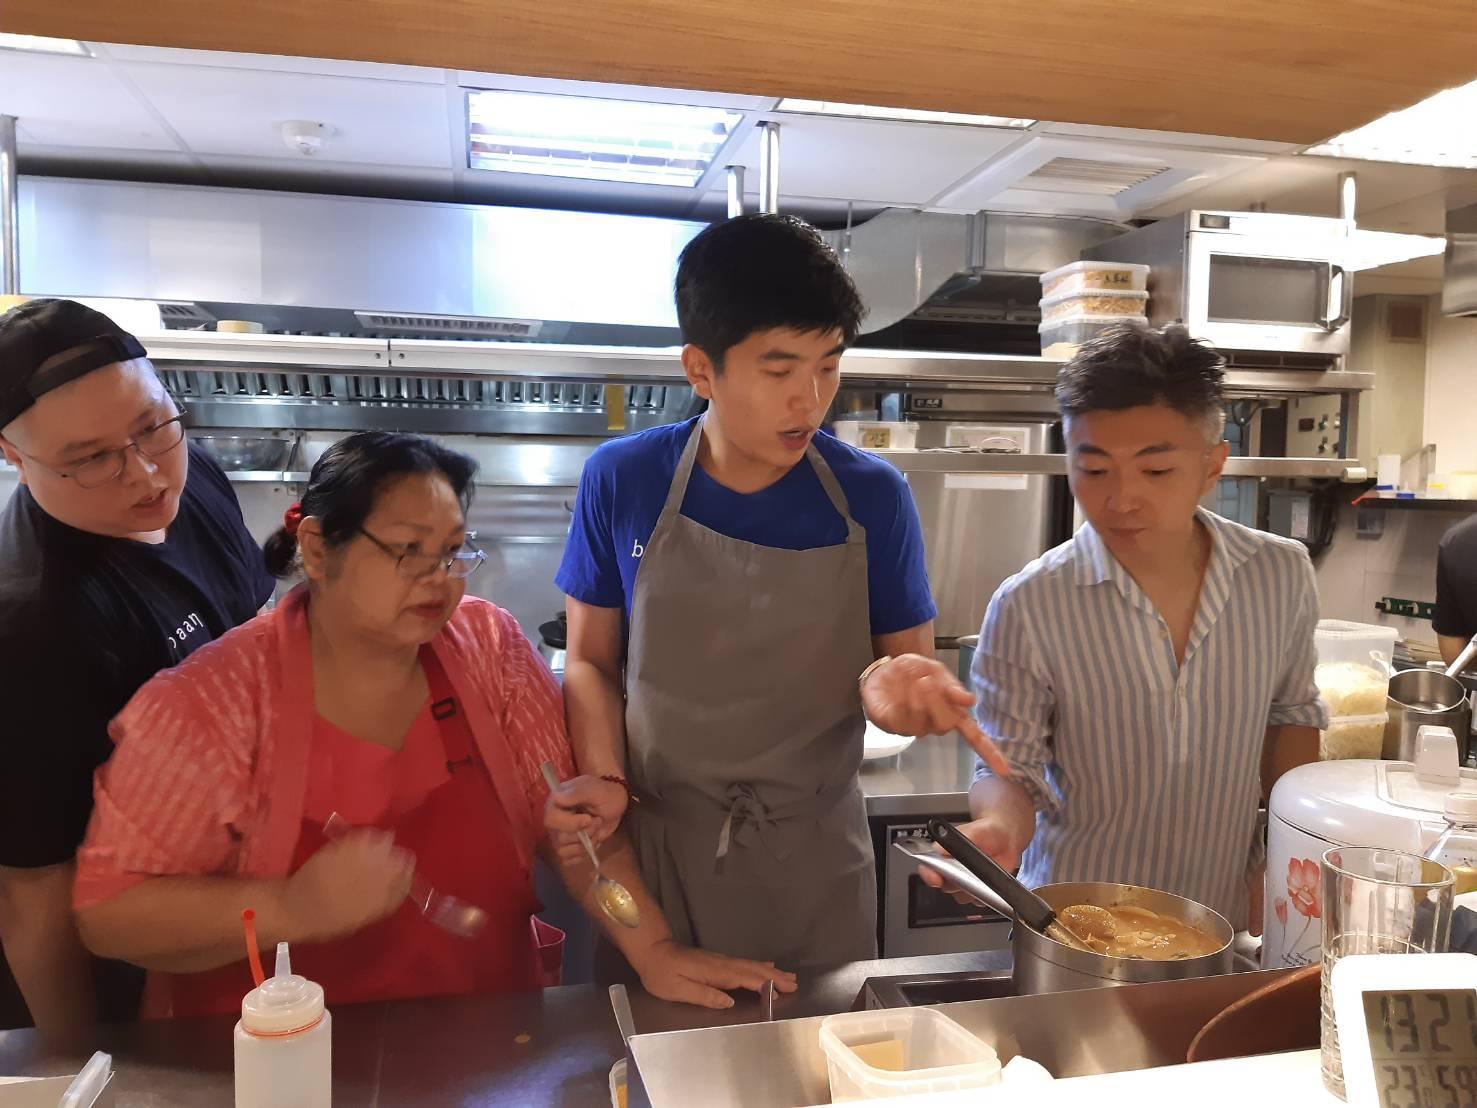 baan 在台北成立一週年,Chef Ton 以及台北 Mume 主廚林泉特地推出新菜,在泰國 baan 掌勺的 Chef Ton 奶媽(左二)也特地來台。最左方為 Baan Taipei 主廚簡士捷(AJ)。(謝明玲攝)